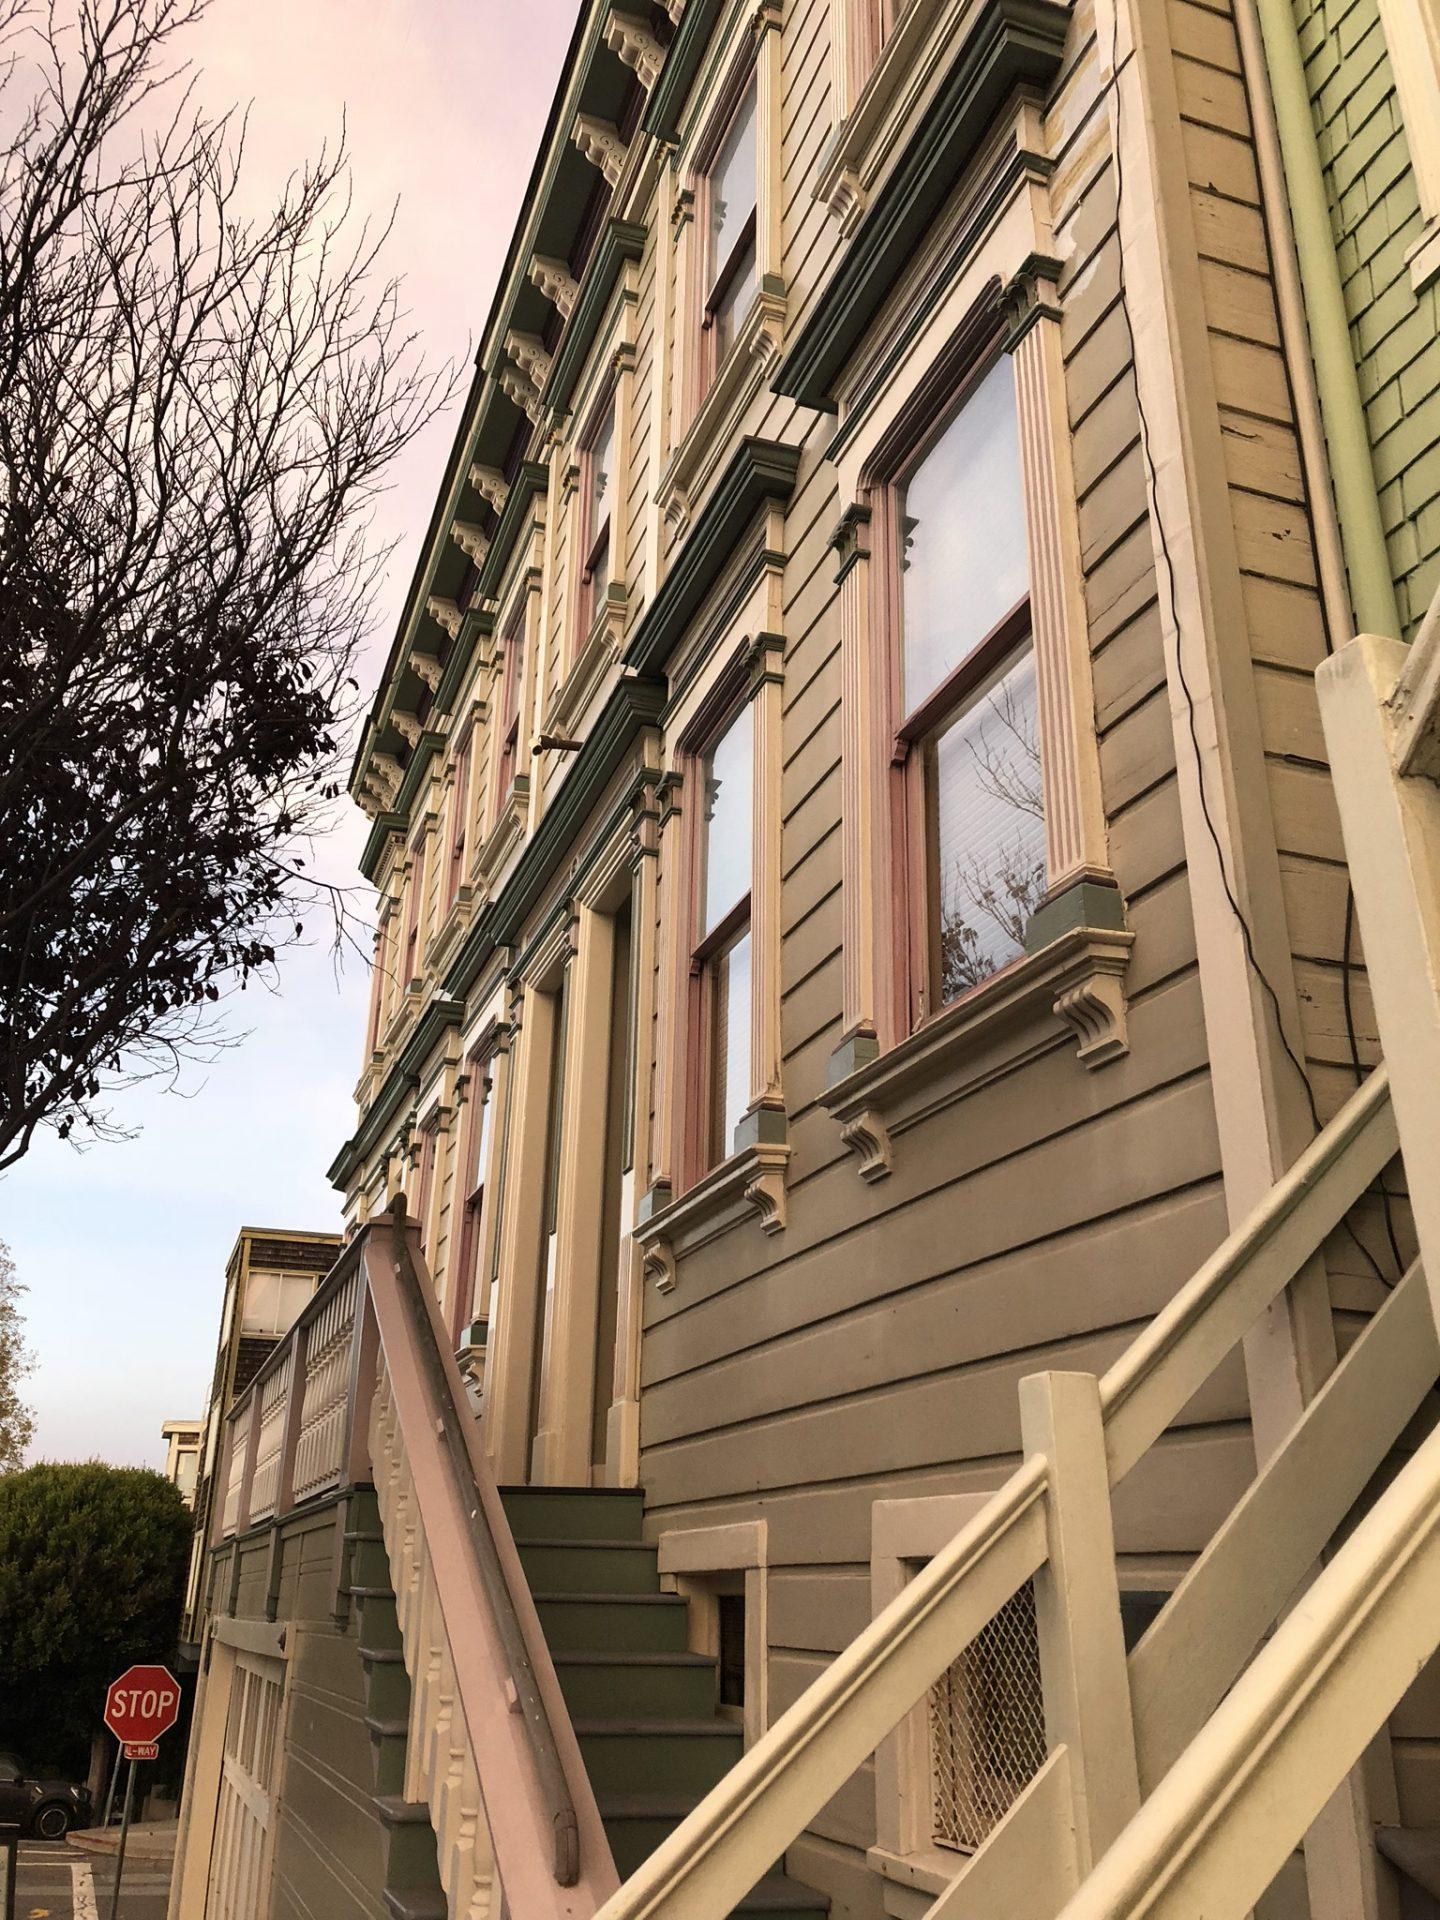 San Francisco houses at sunset